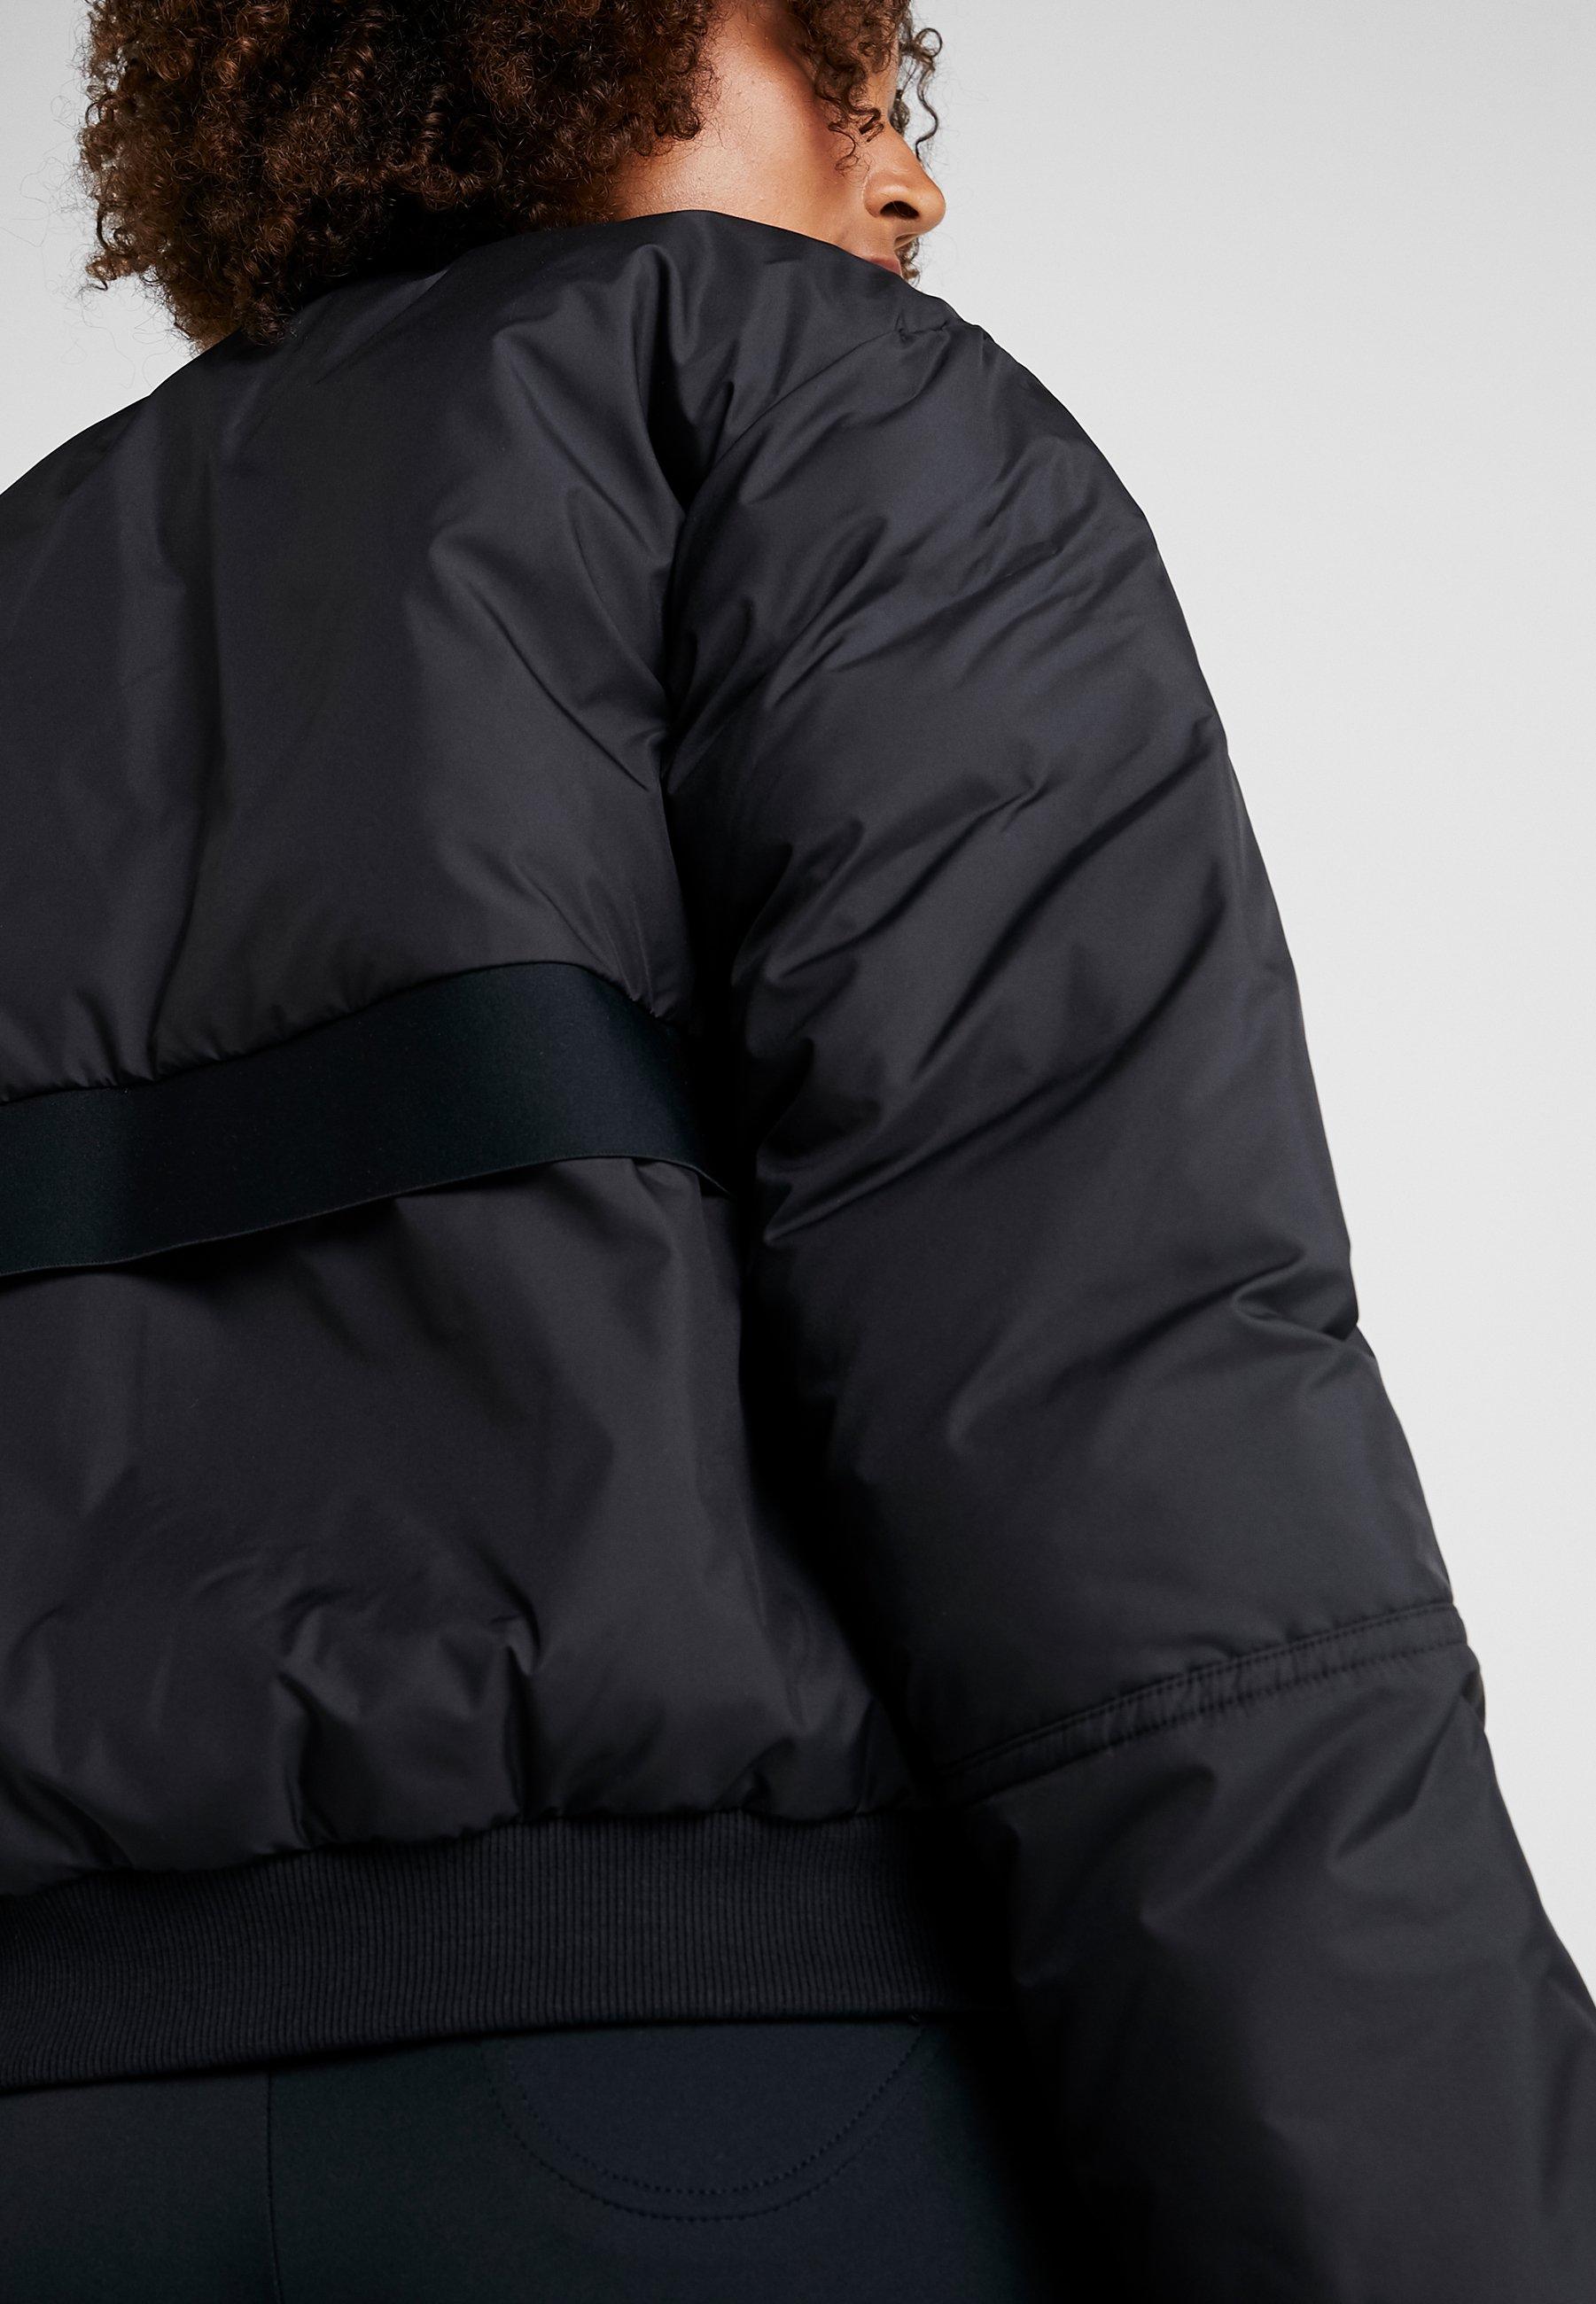 Adidas Stella BomberjacketGiacca Padded Invernale Sport Black Athletic By Mccartney jL3R54A